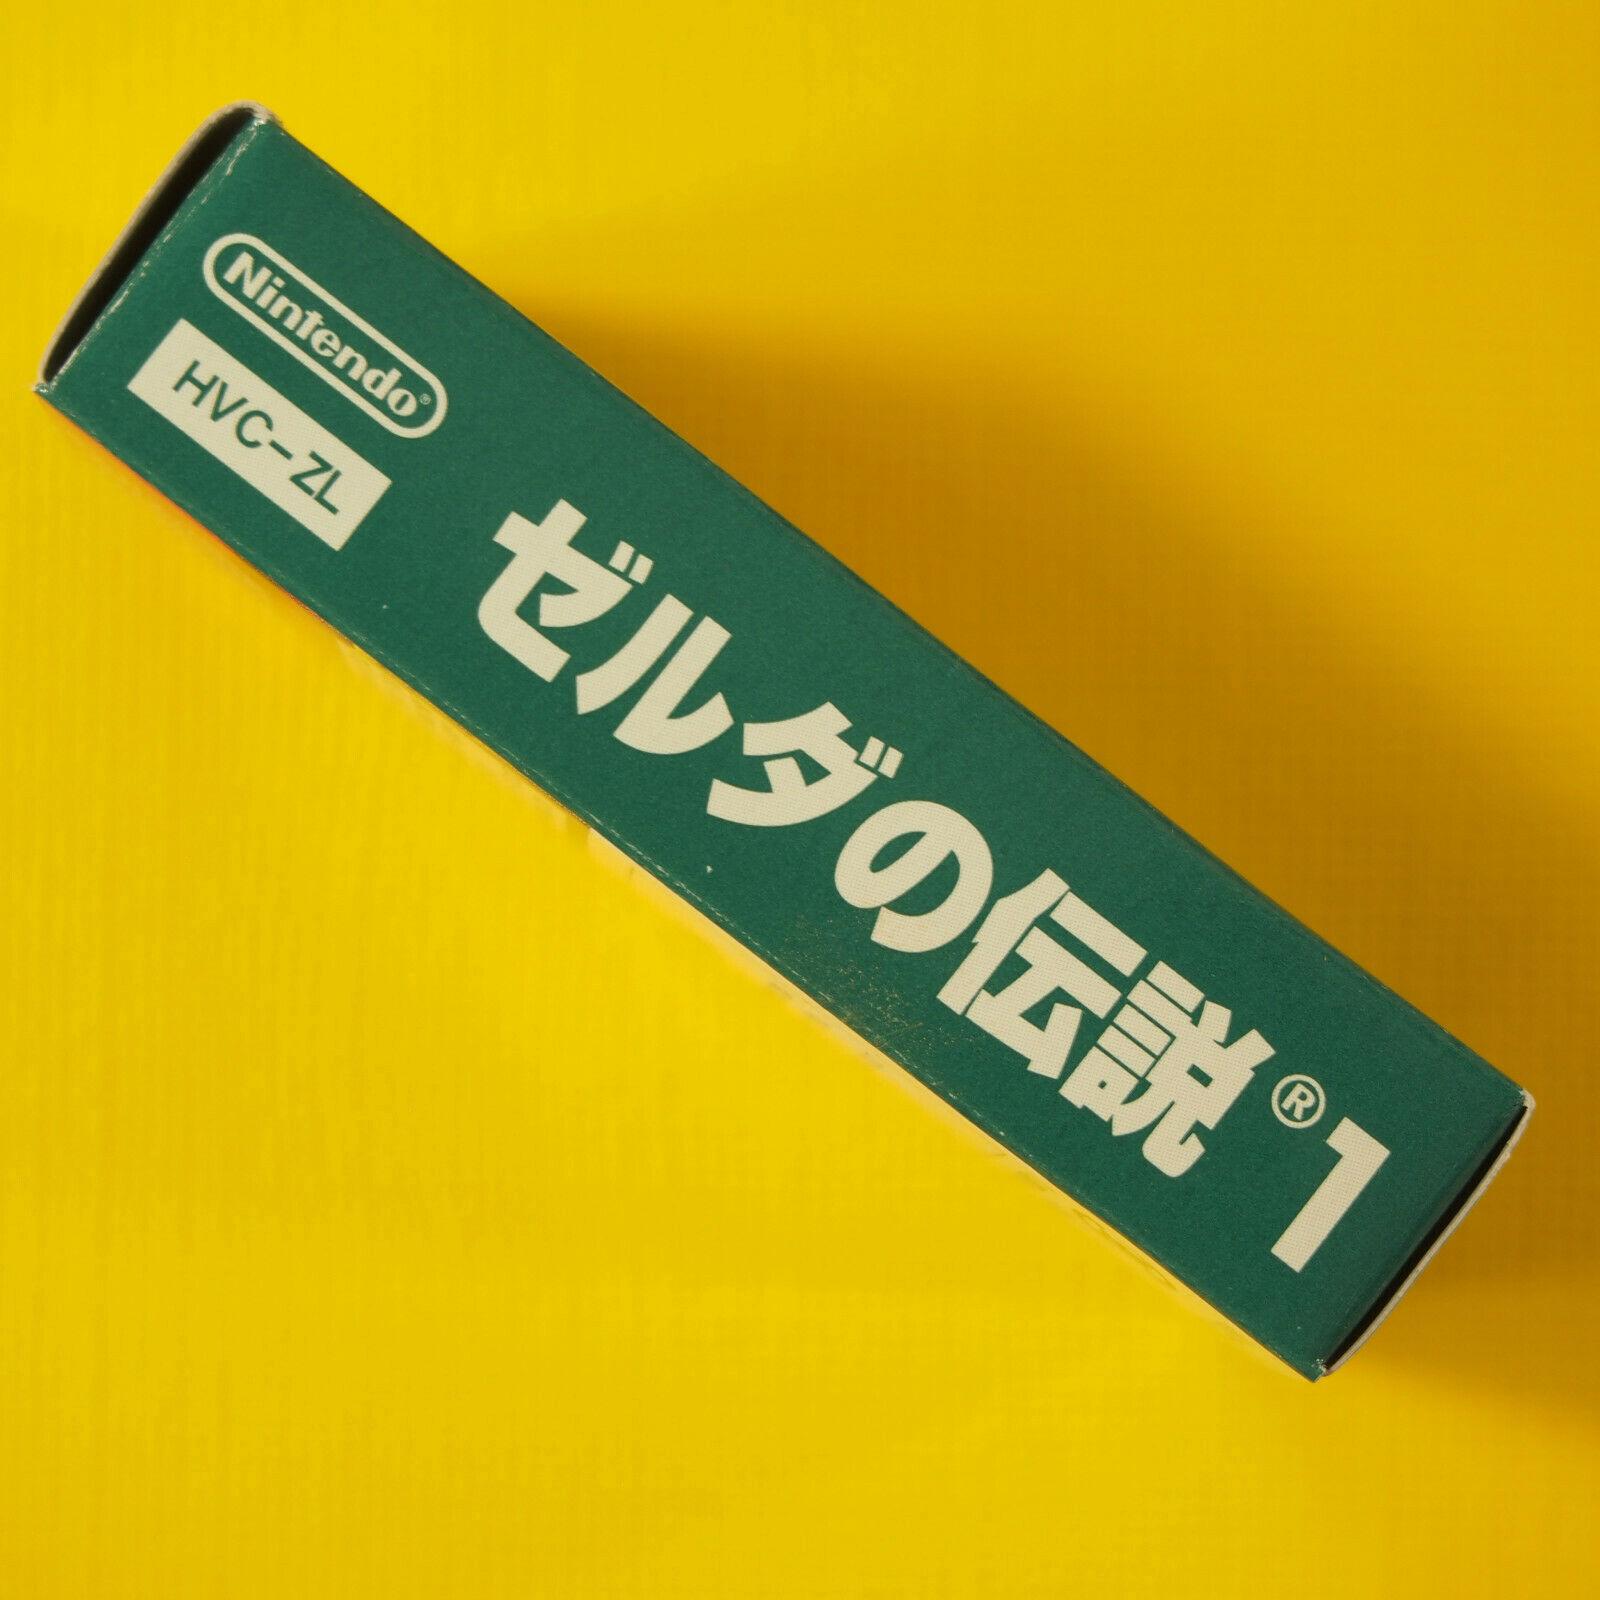 Legend of Zelda: Famicom Mini Complete (Nintendo Gameboy Advance GBA 2004) Japan image 6